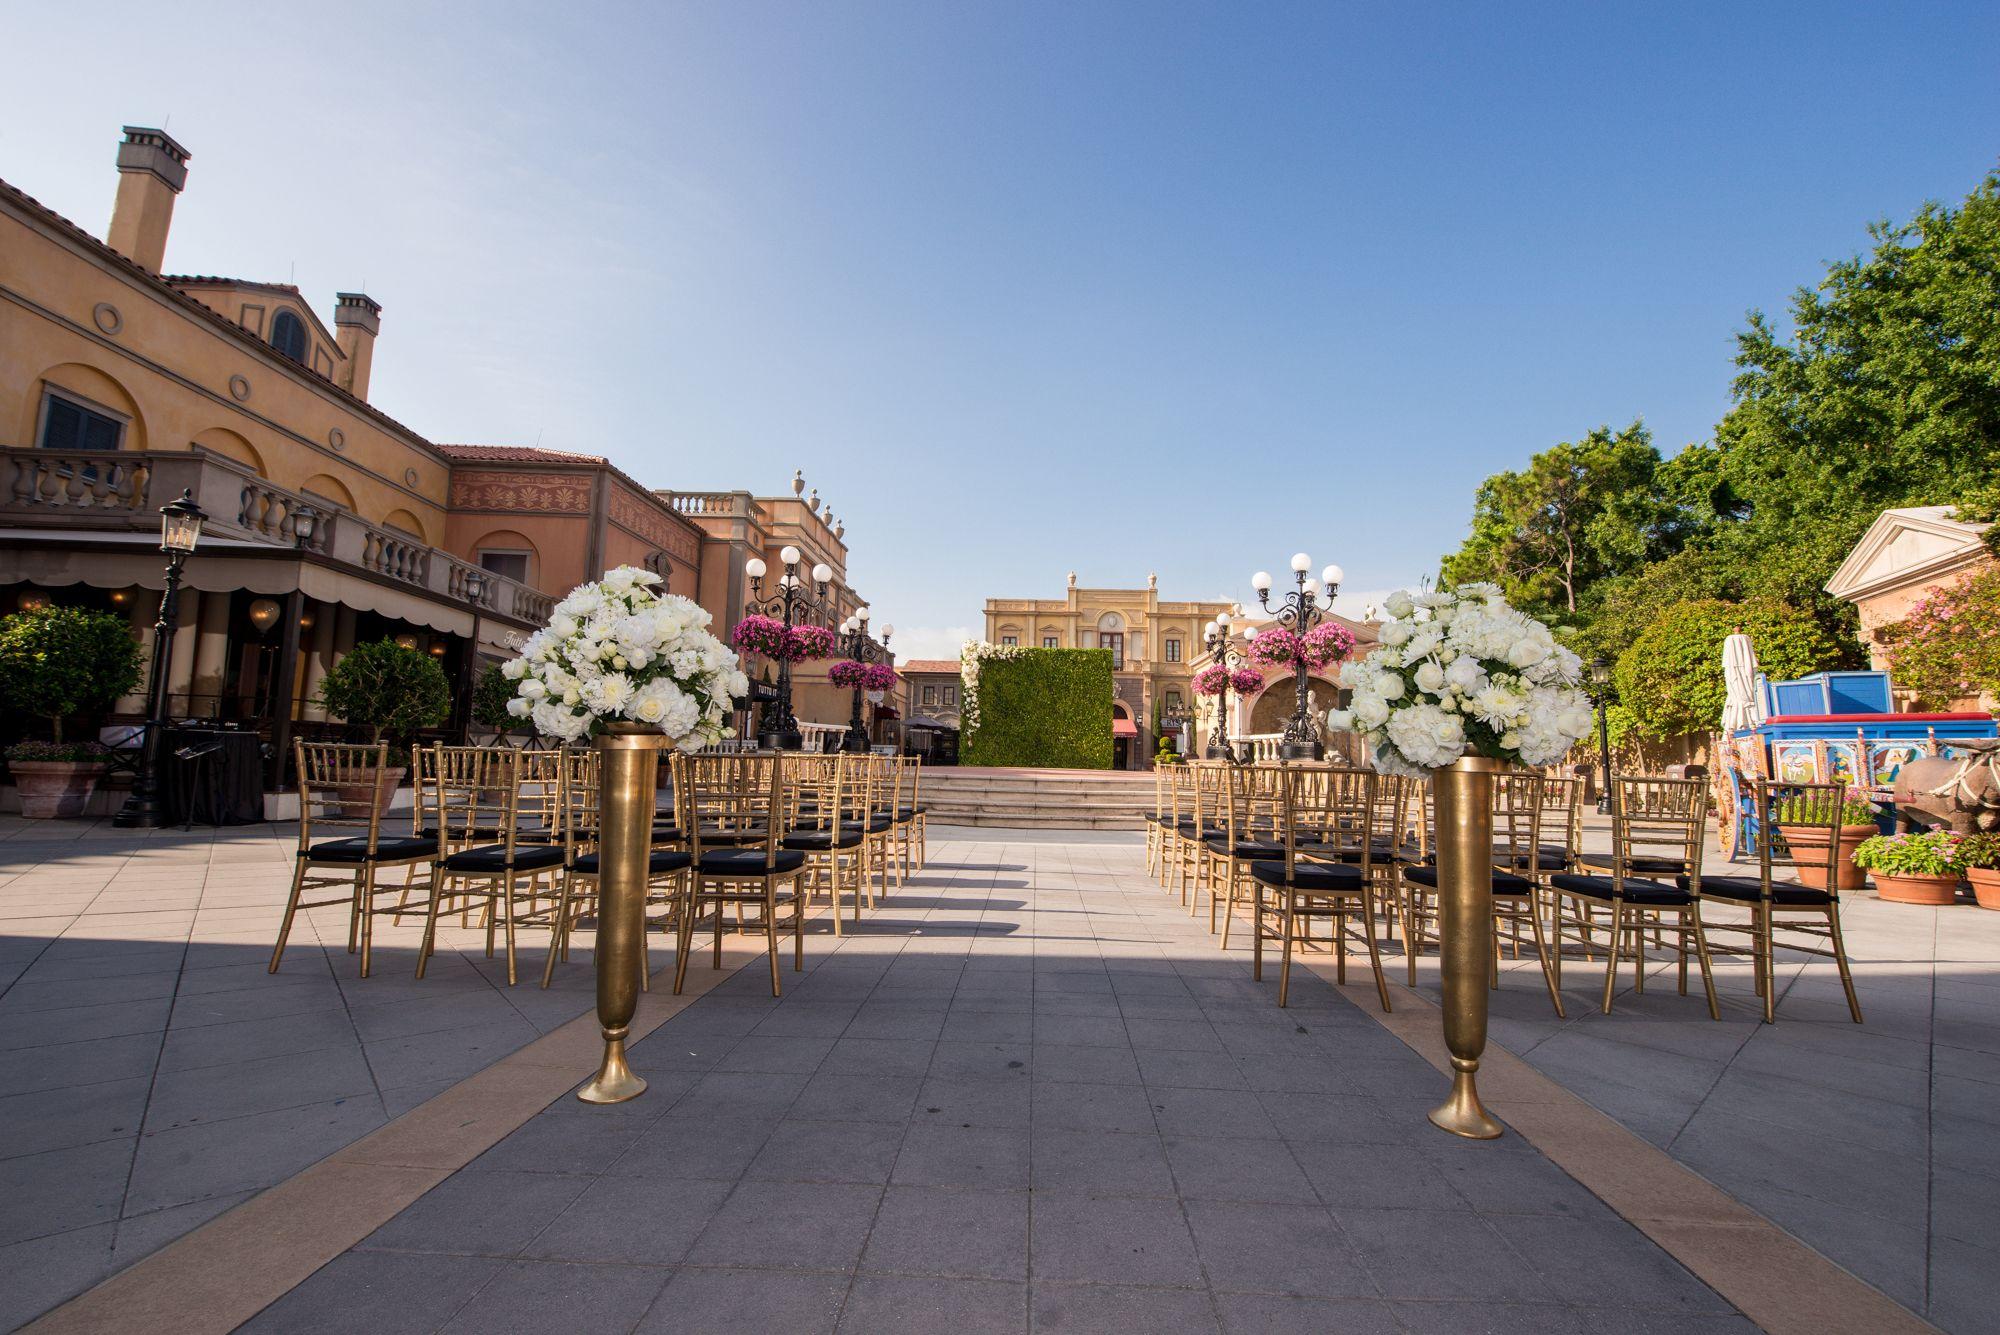 Italy Courtyard | Disney Wedding | Epcot Wedding | Florida ...